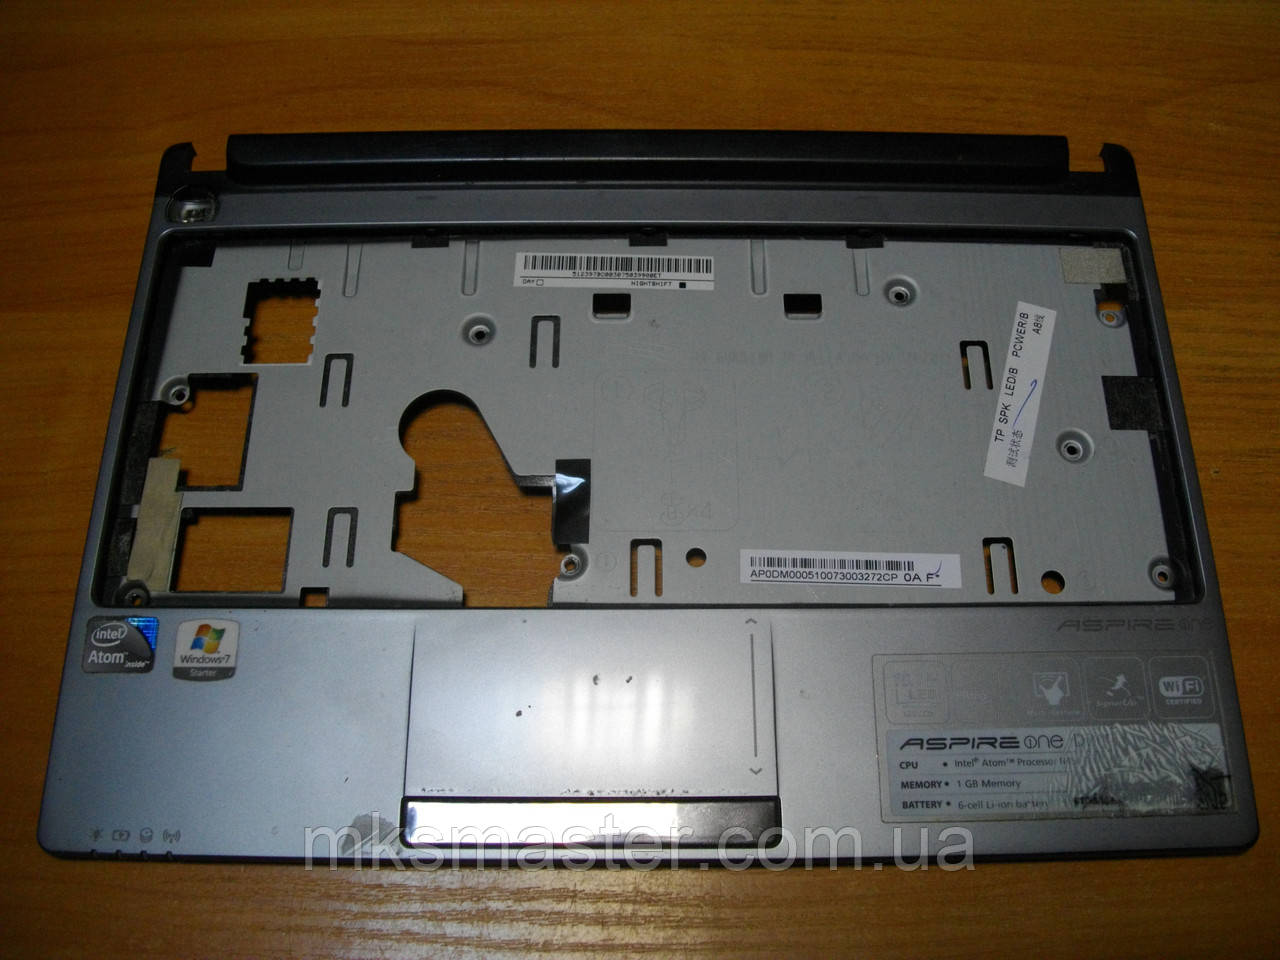 Корпус верхня частина з тачпадом Acer Aspire one NAV70. Оригінальні.